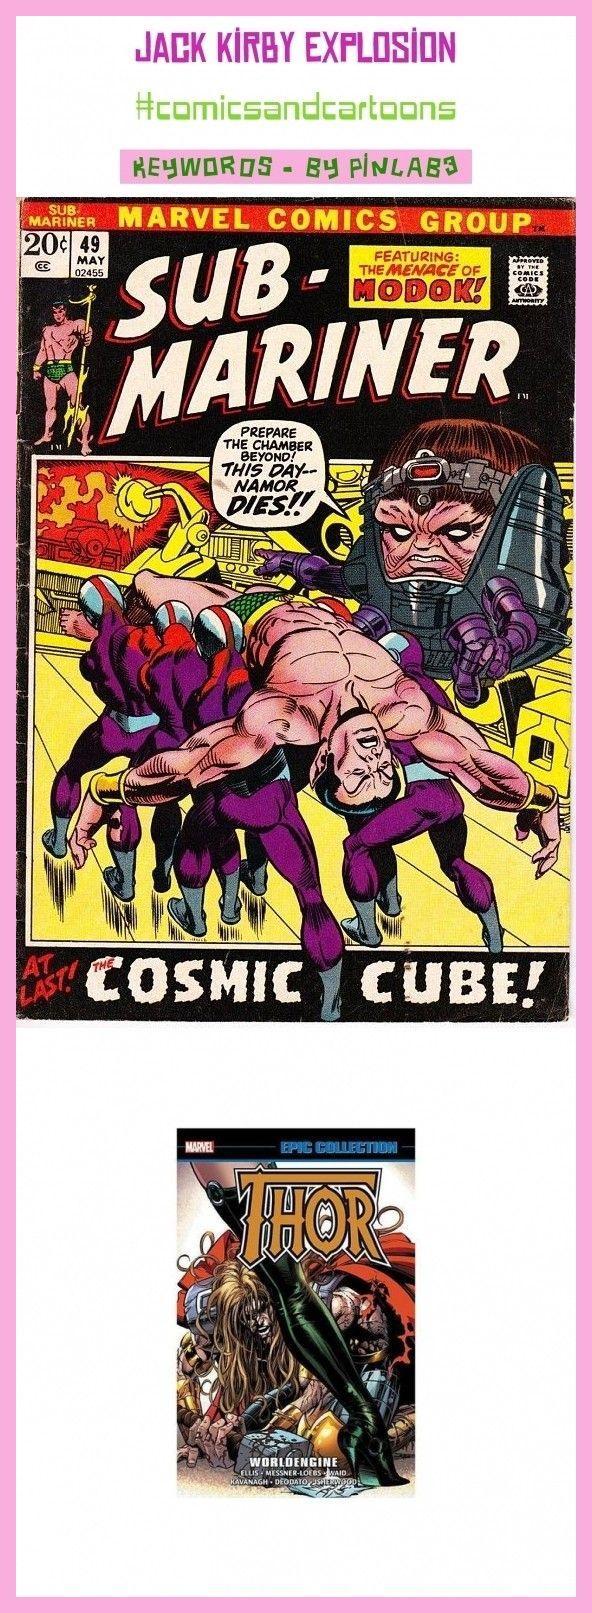 Jack kirby explosion Jack Kirby Explosion ,  explosion de Jack Kirby ,  explosión de Jack Kirby ,